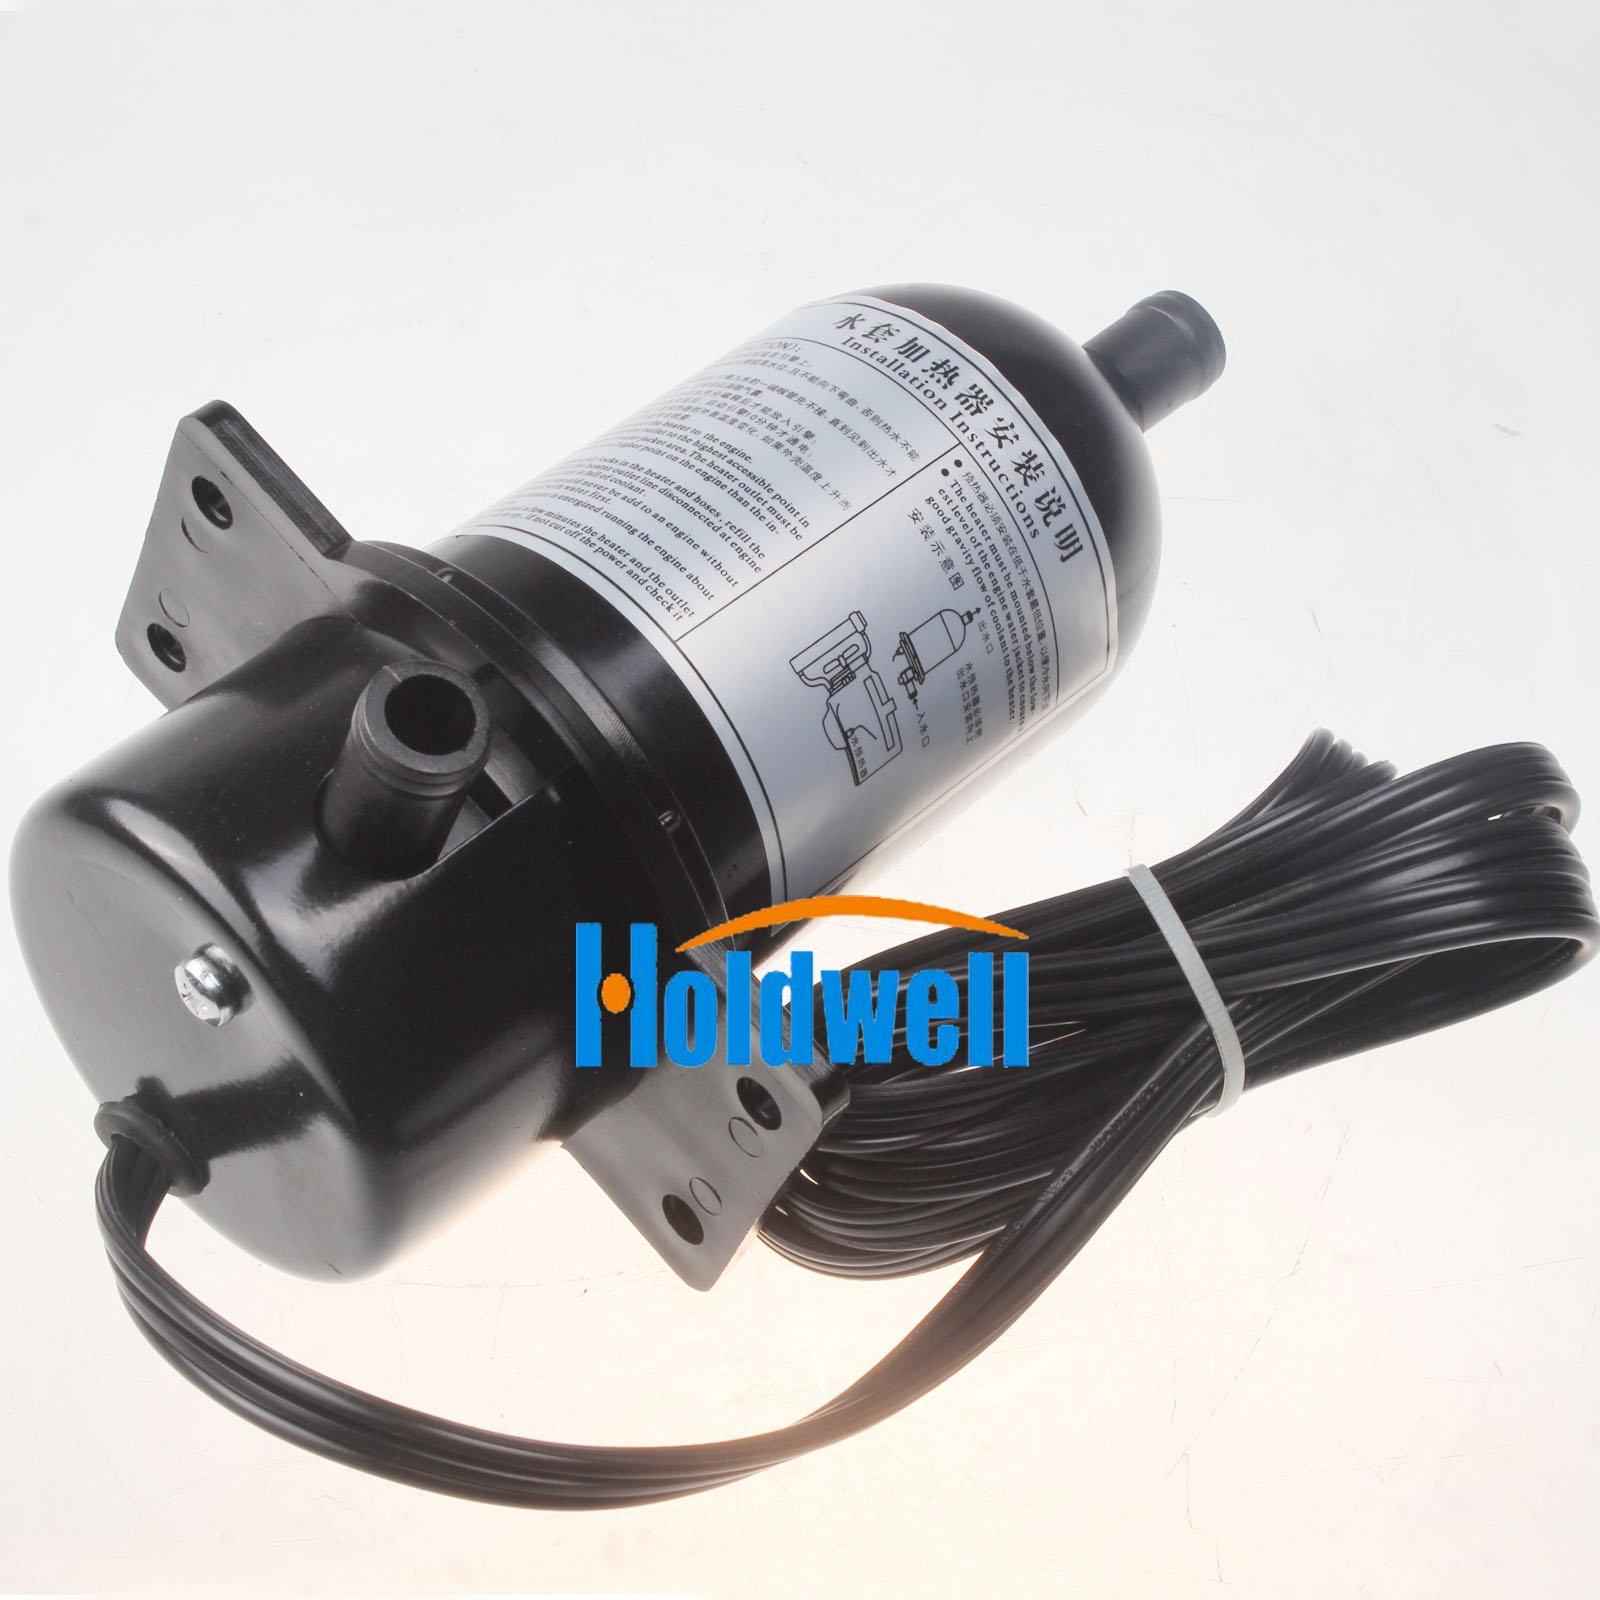 Holdwell Pre-Heater 1500W 240V Pre Heater by Holdwell